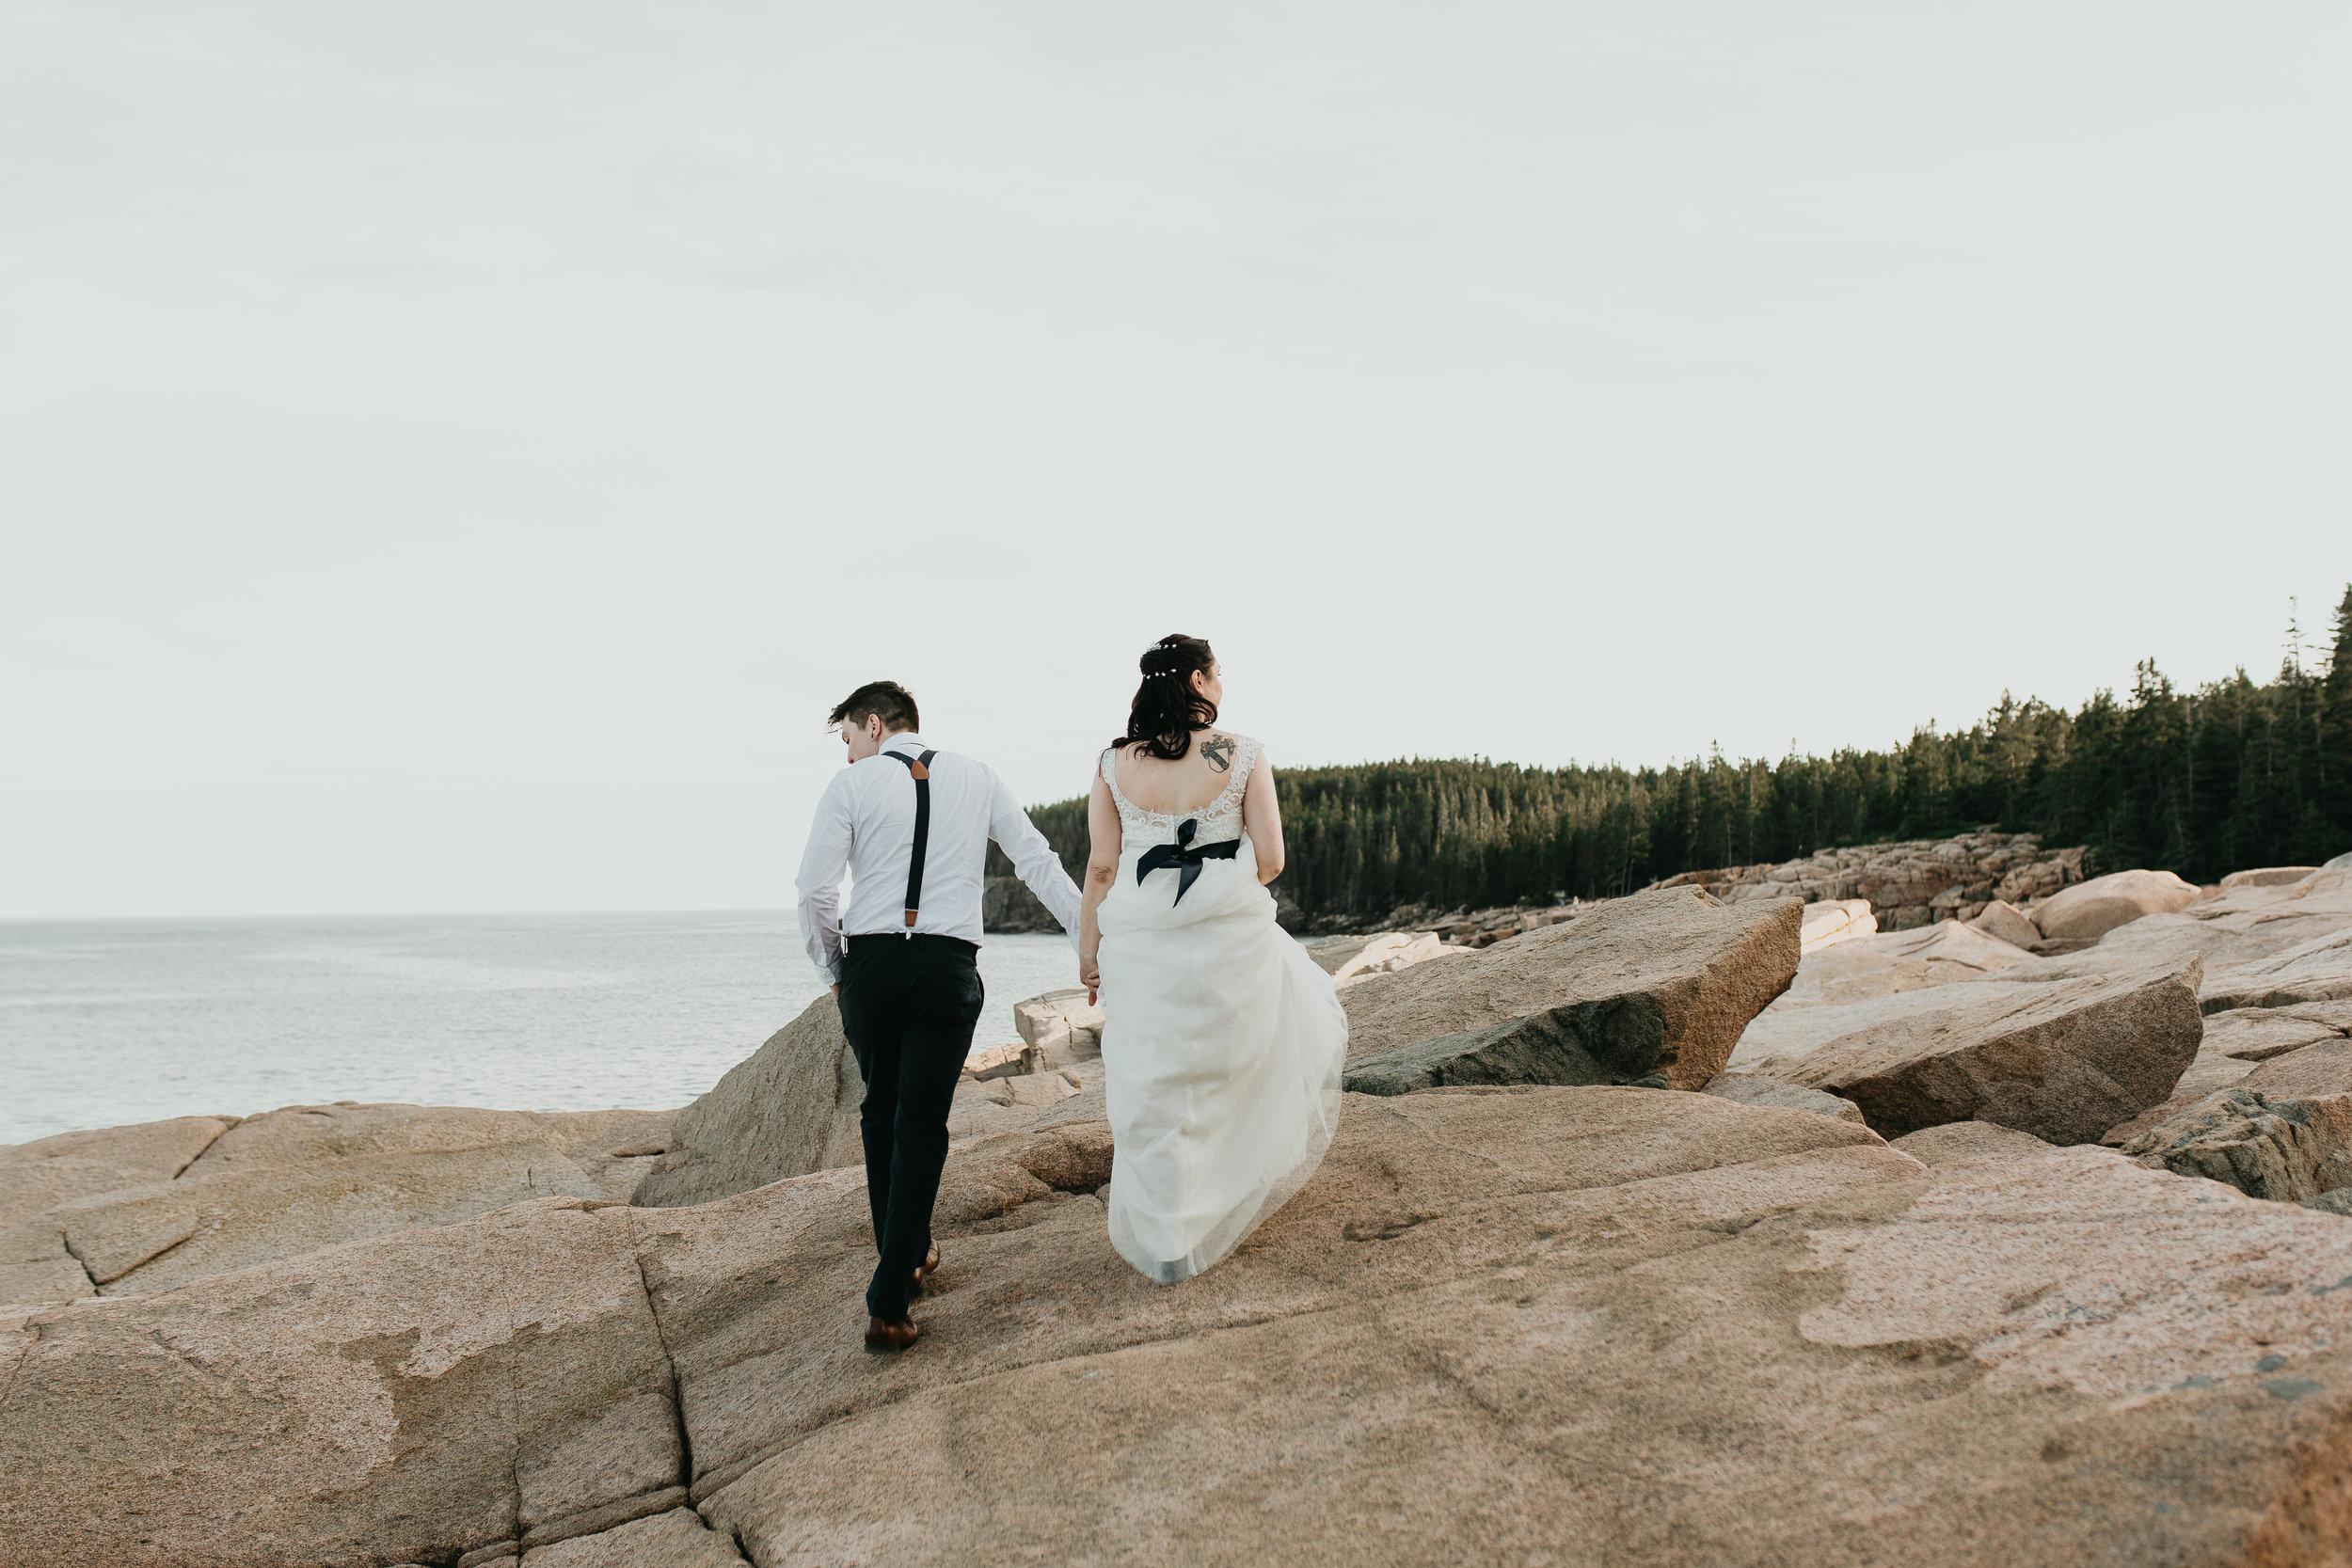 nicole-daacke-photography-Elopement-rocky-shoreline-coast-Acadia-National-Park-elopement-photographer-inspiration-maine-elopement-otter-cliffs-schoonic-head-point-48.jpg